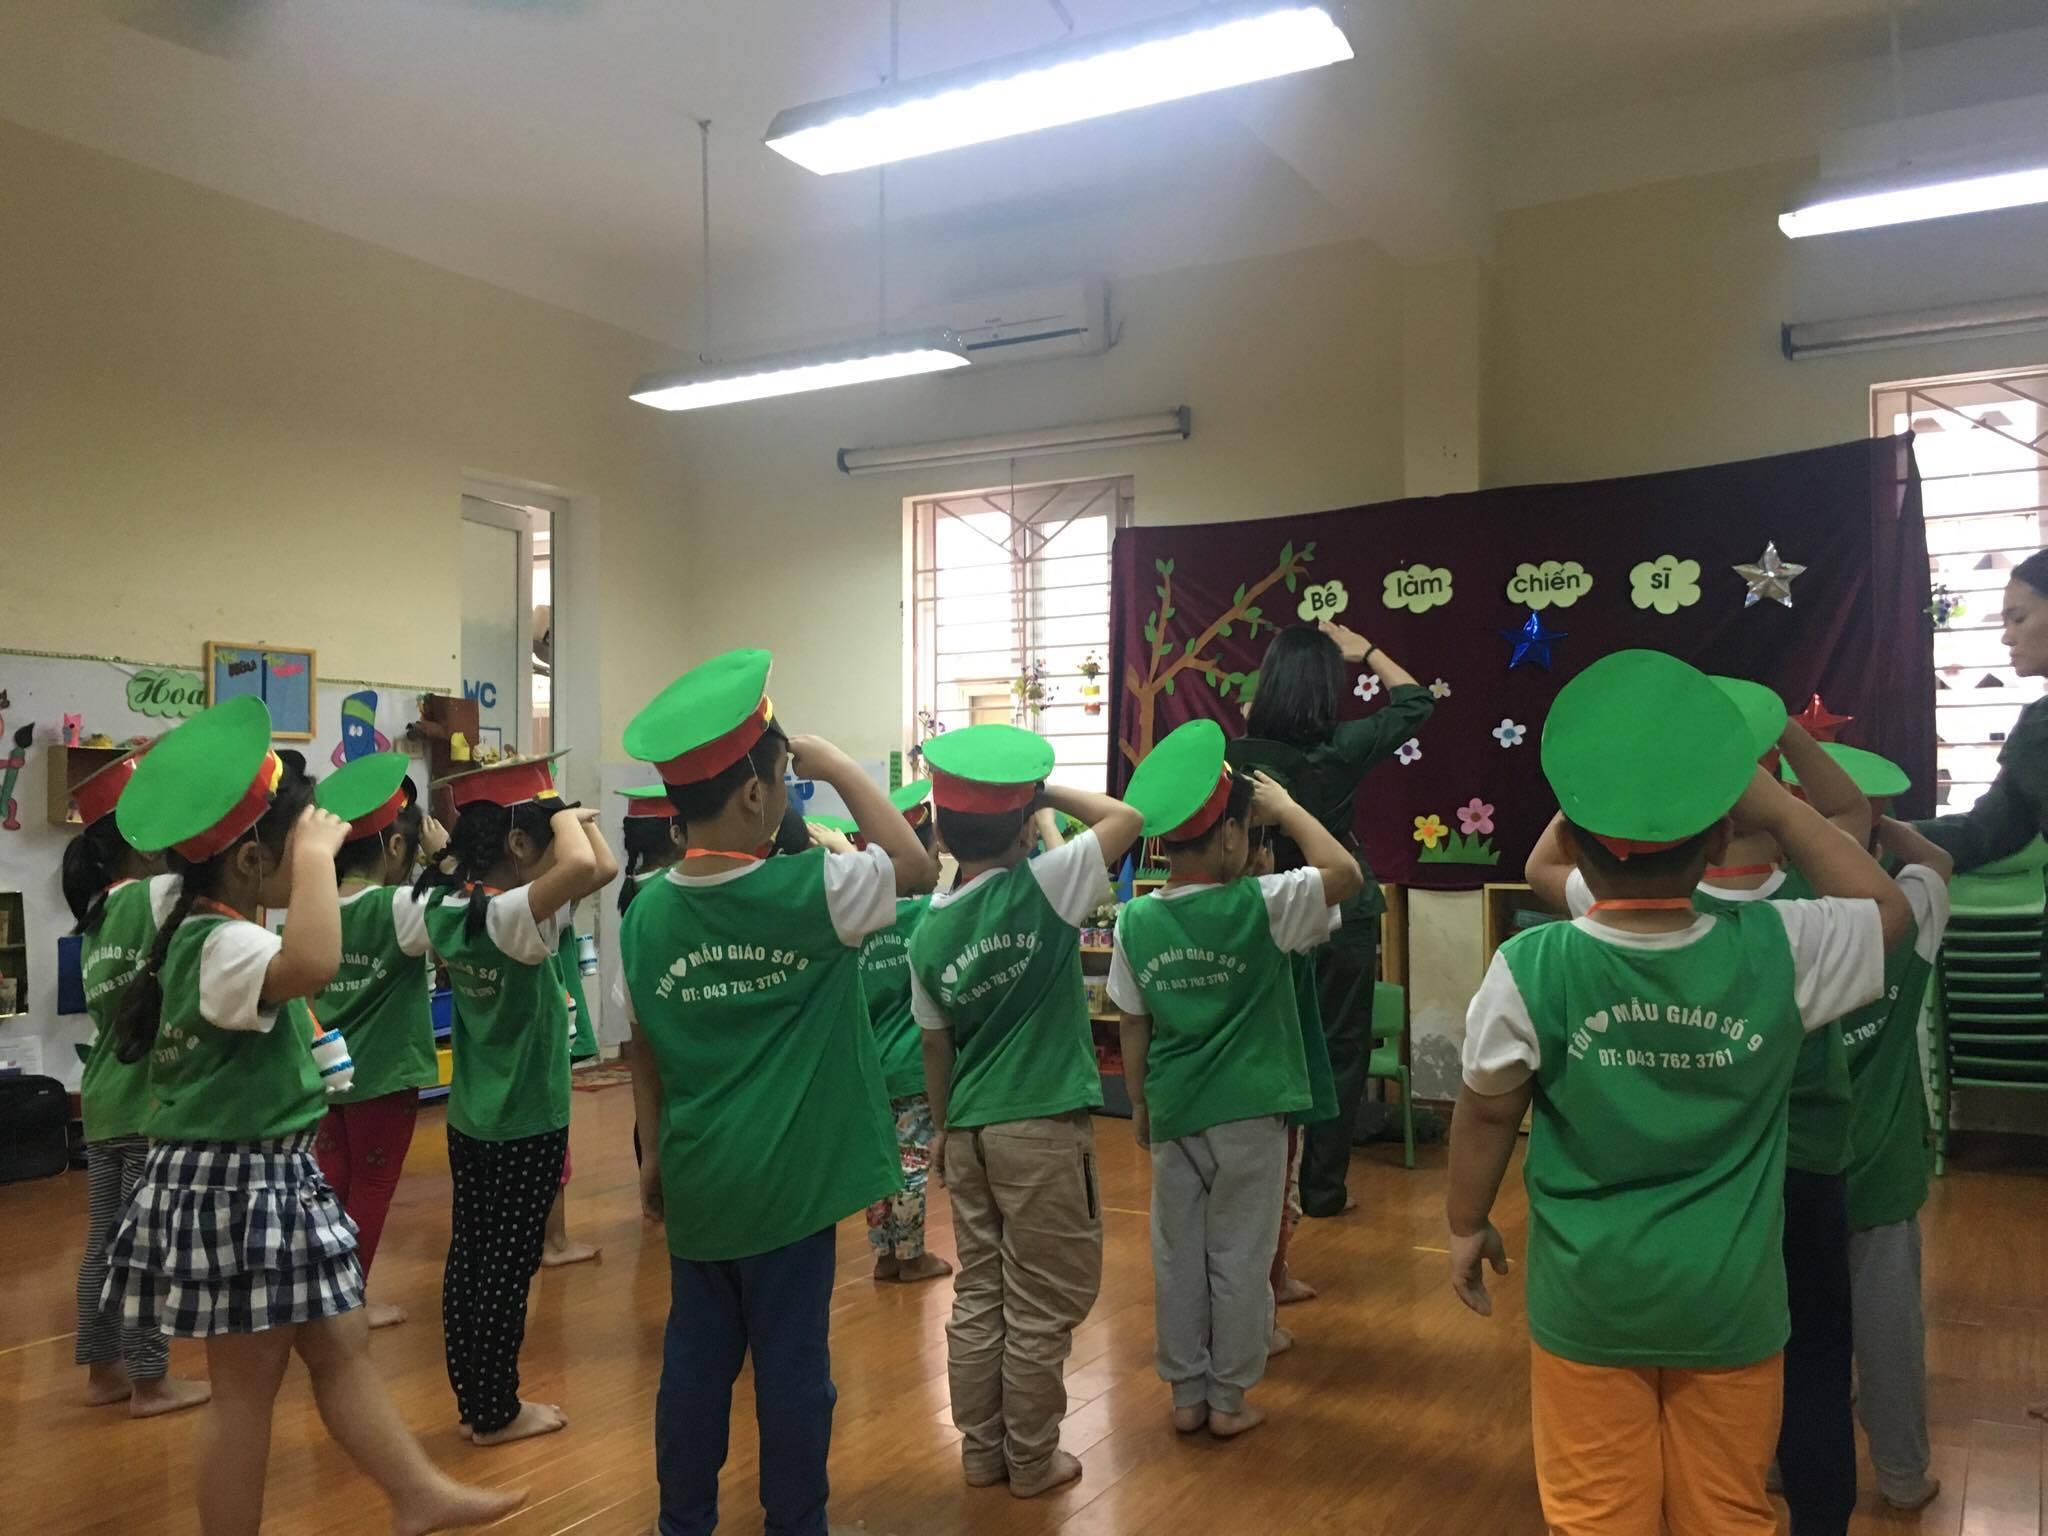 Trường mẫu giáo Số 9 - Liễu GIai